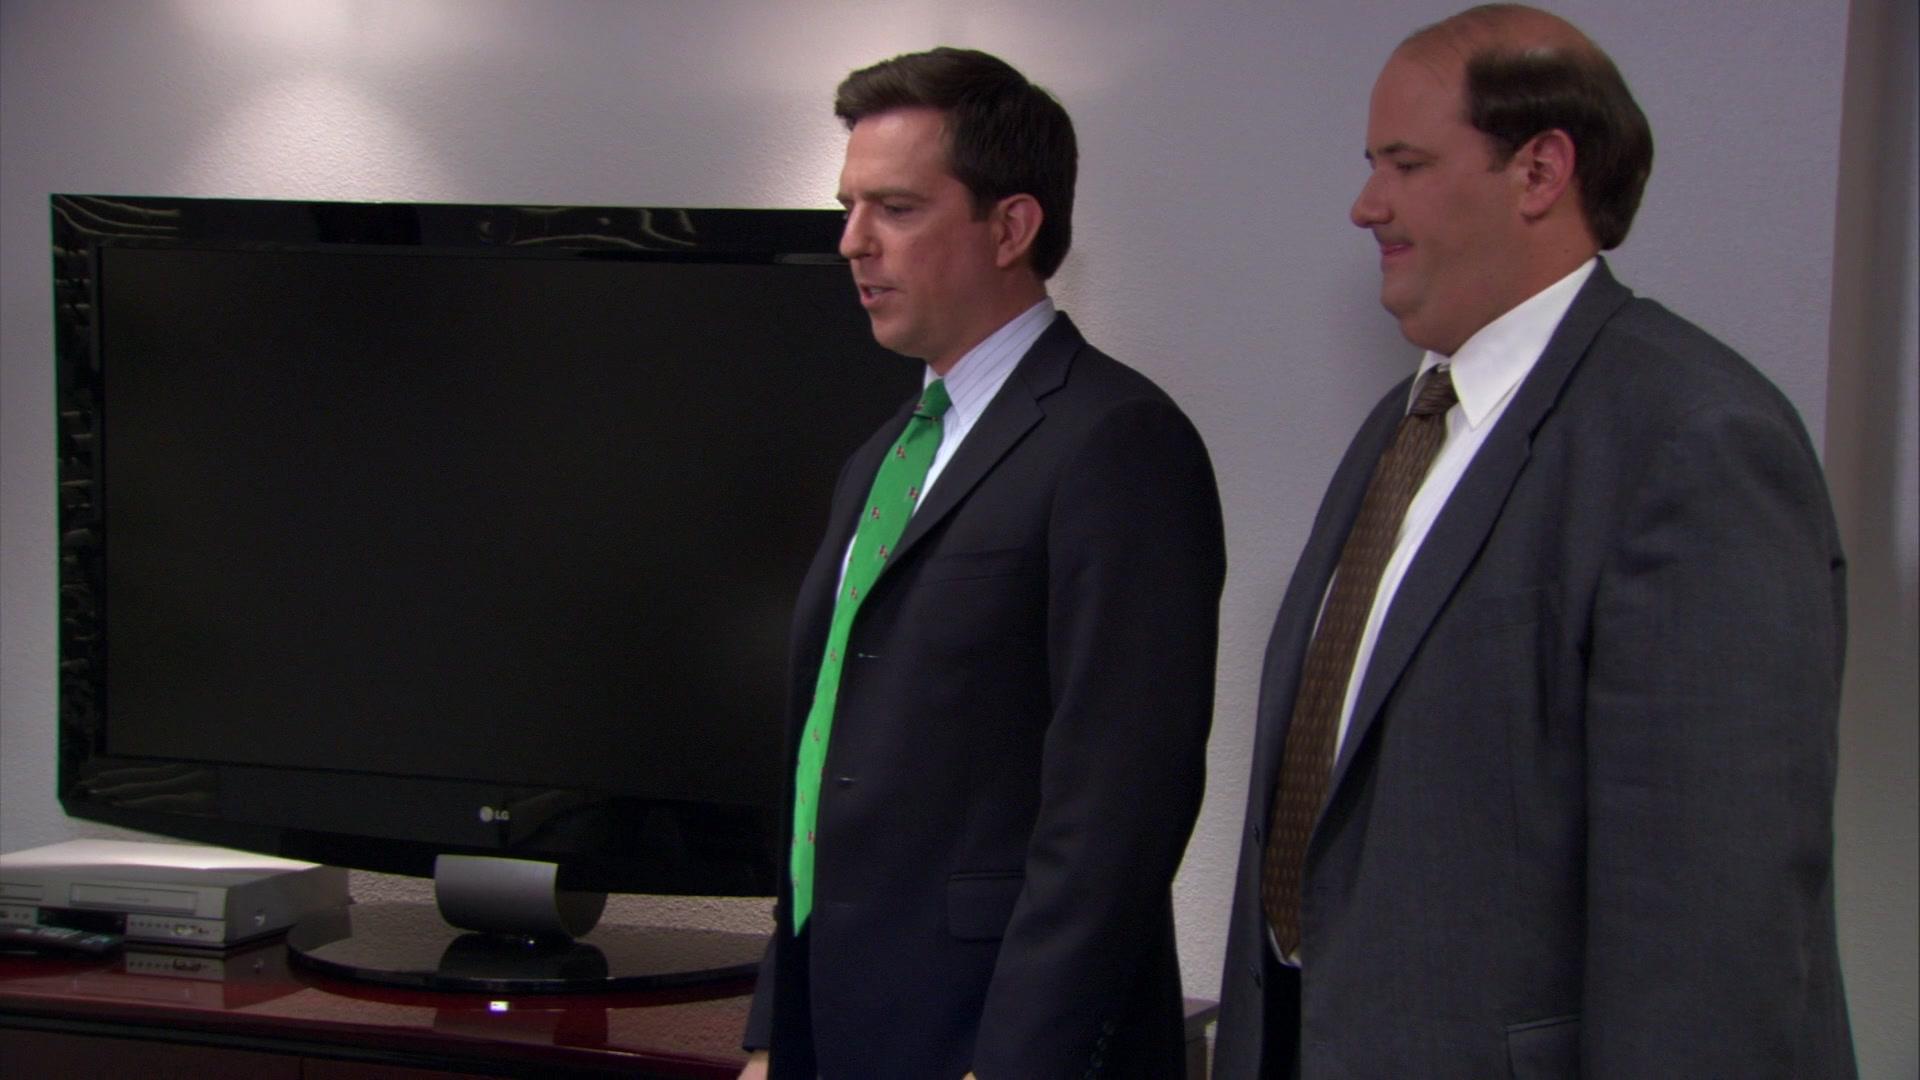 LG Flat TV in The Office – Season 4, Episode 14,